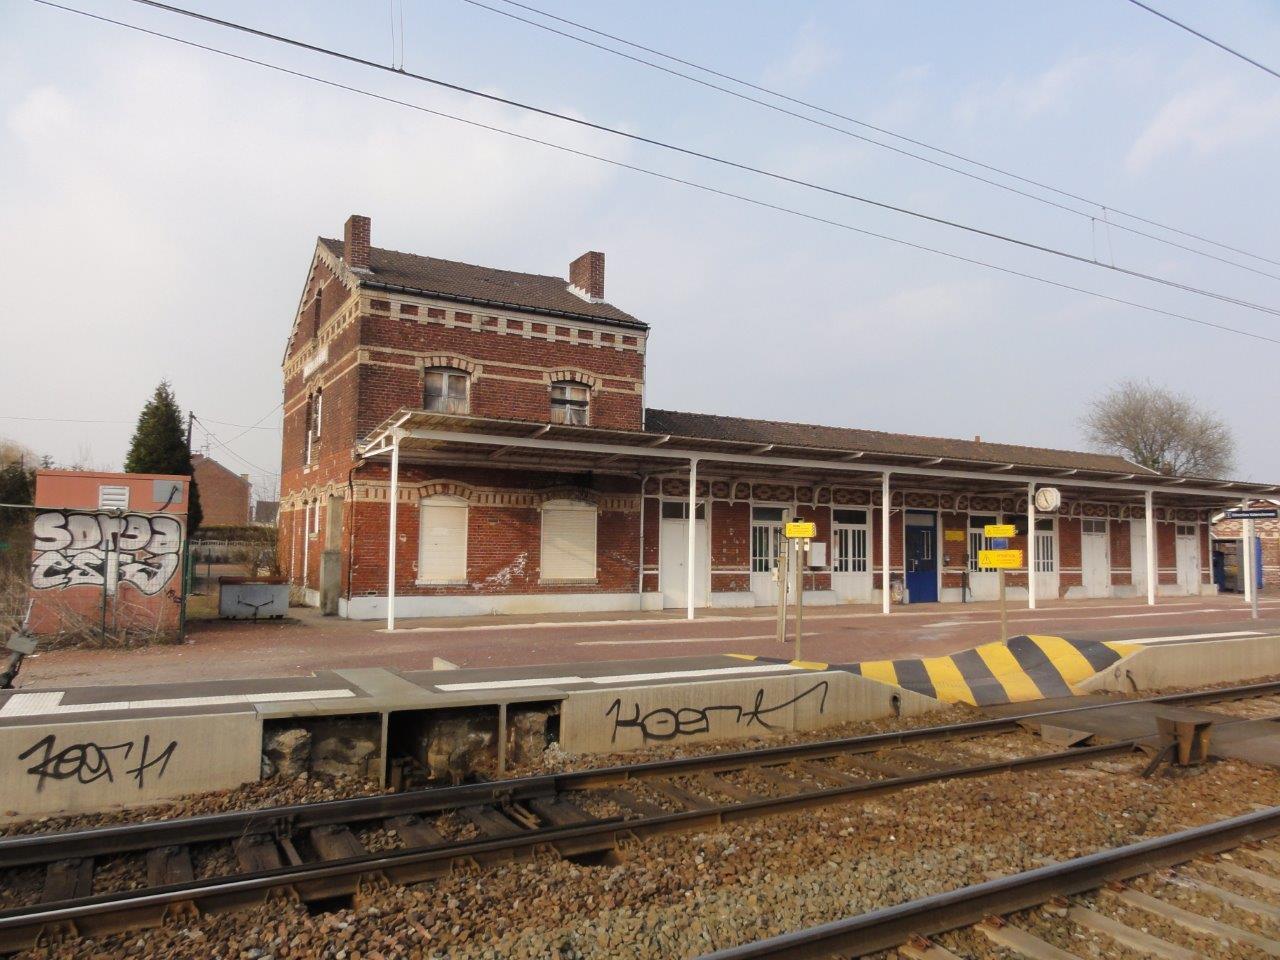 gare-de-raismes-nord-train-station